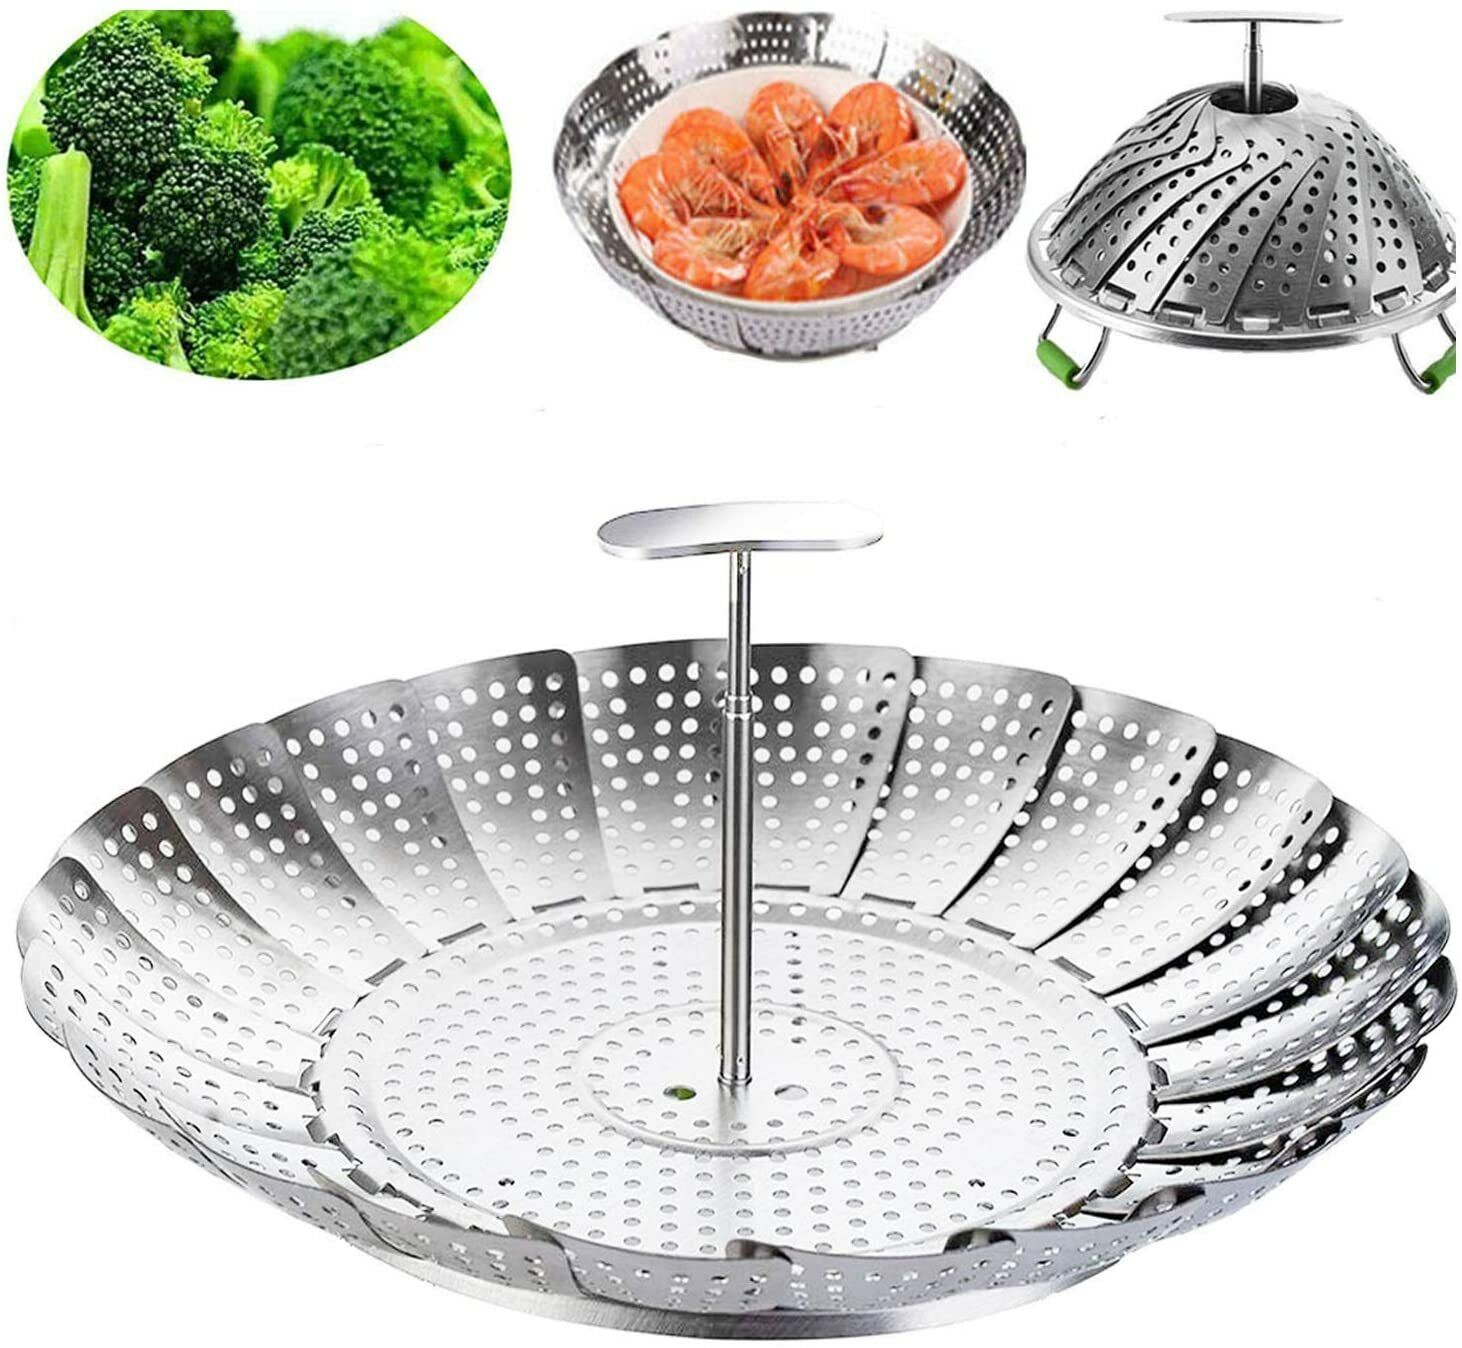 Steamer Basket Stainless Steel Cooking Veggie Seafood Foldin